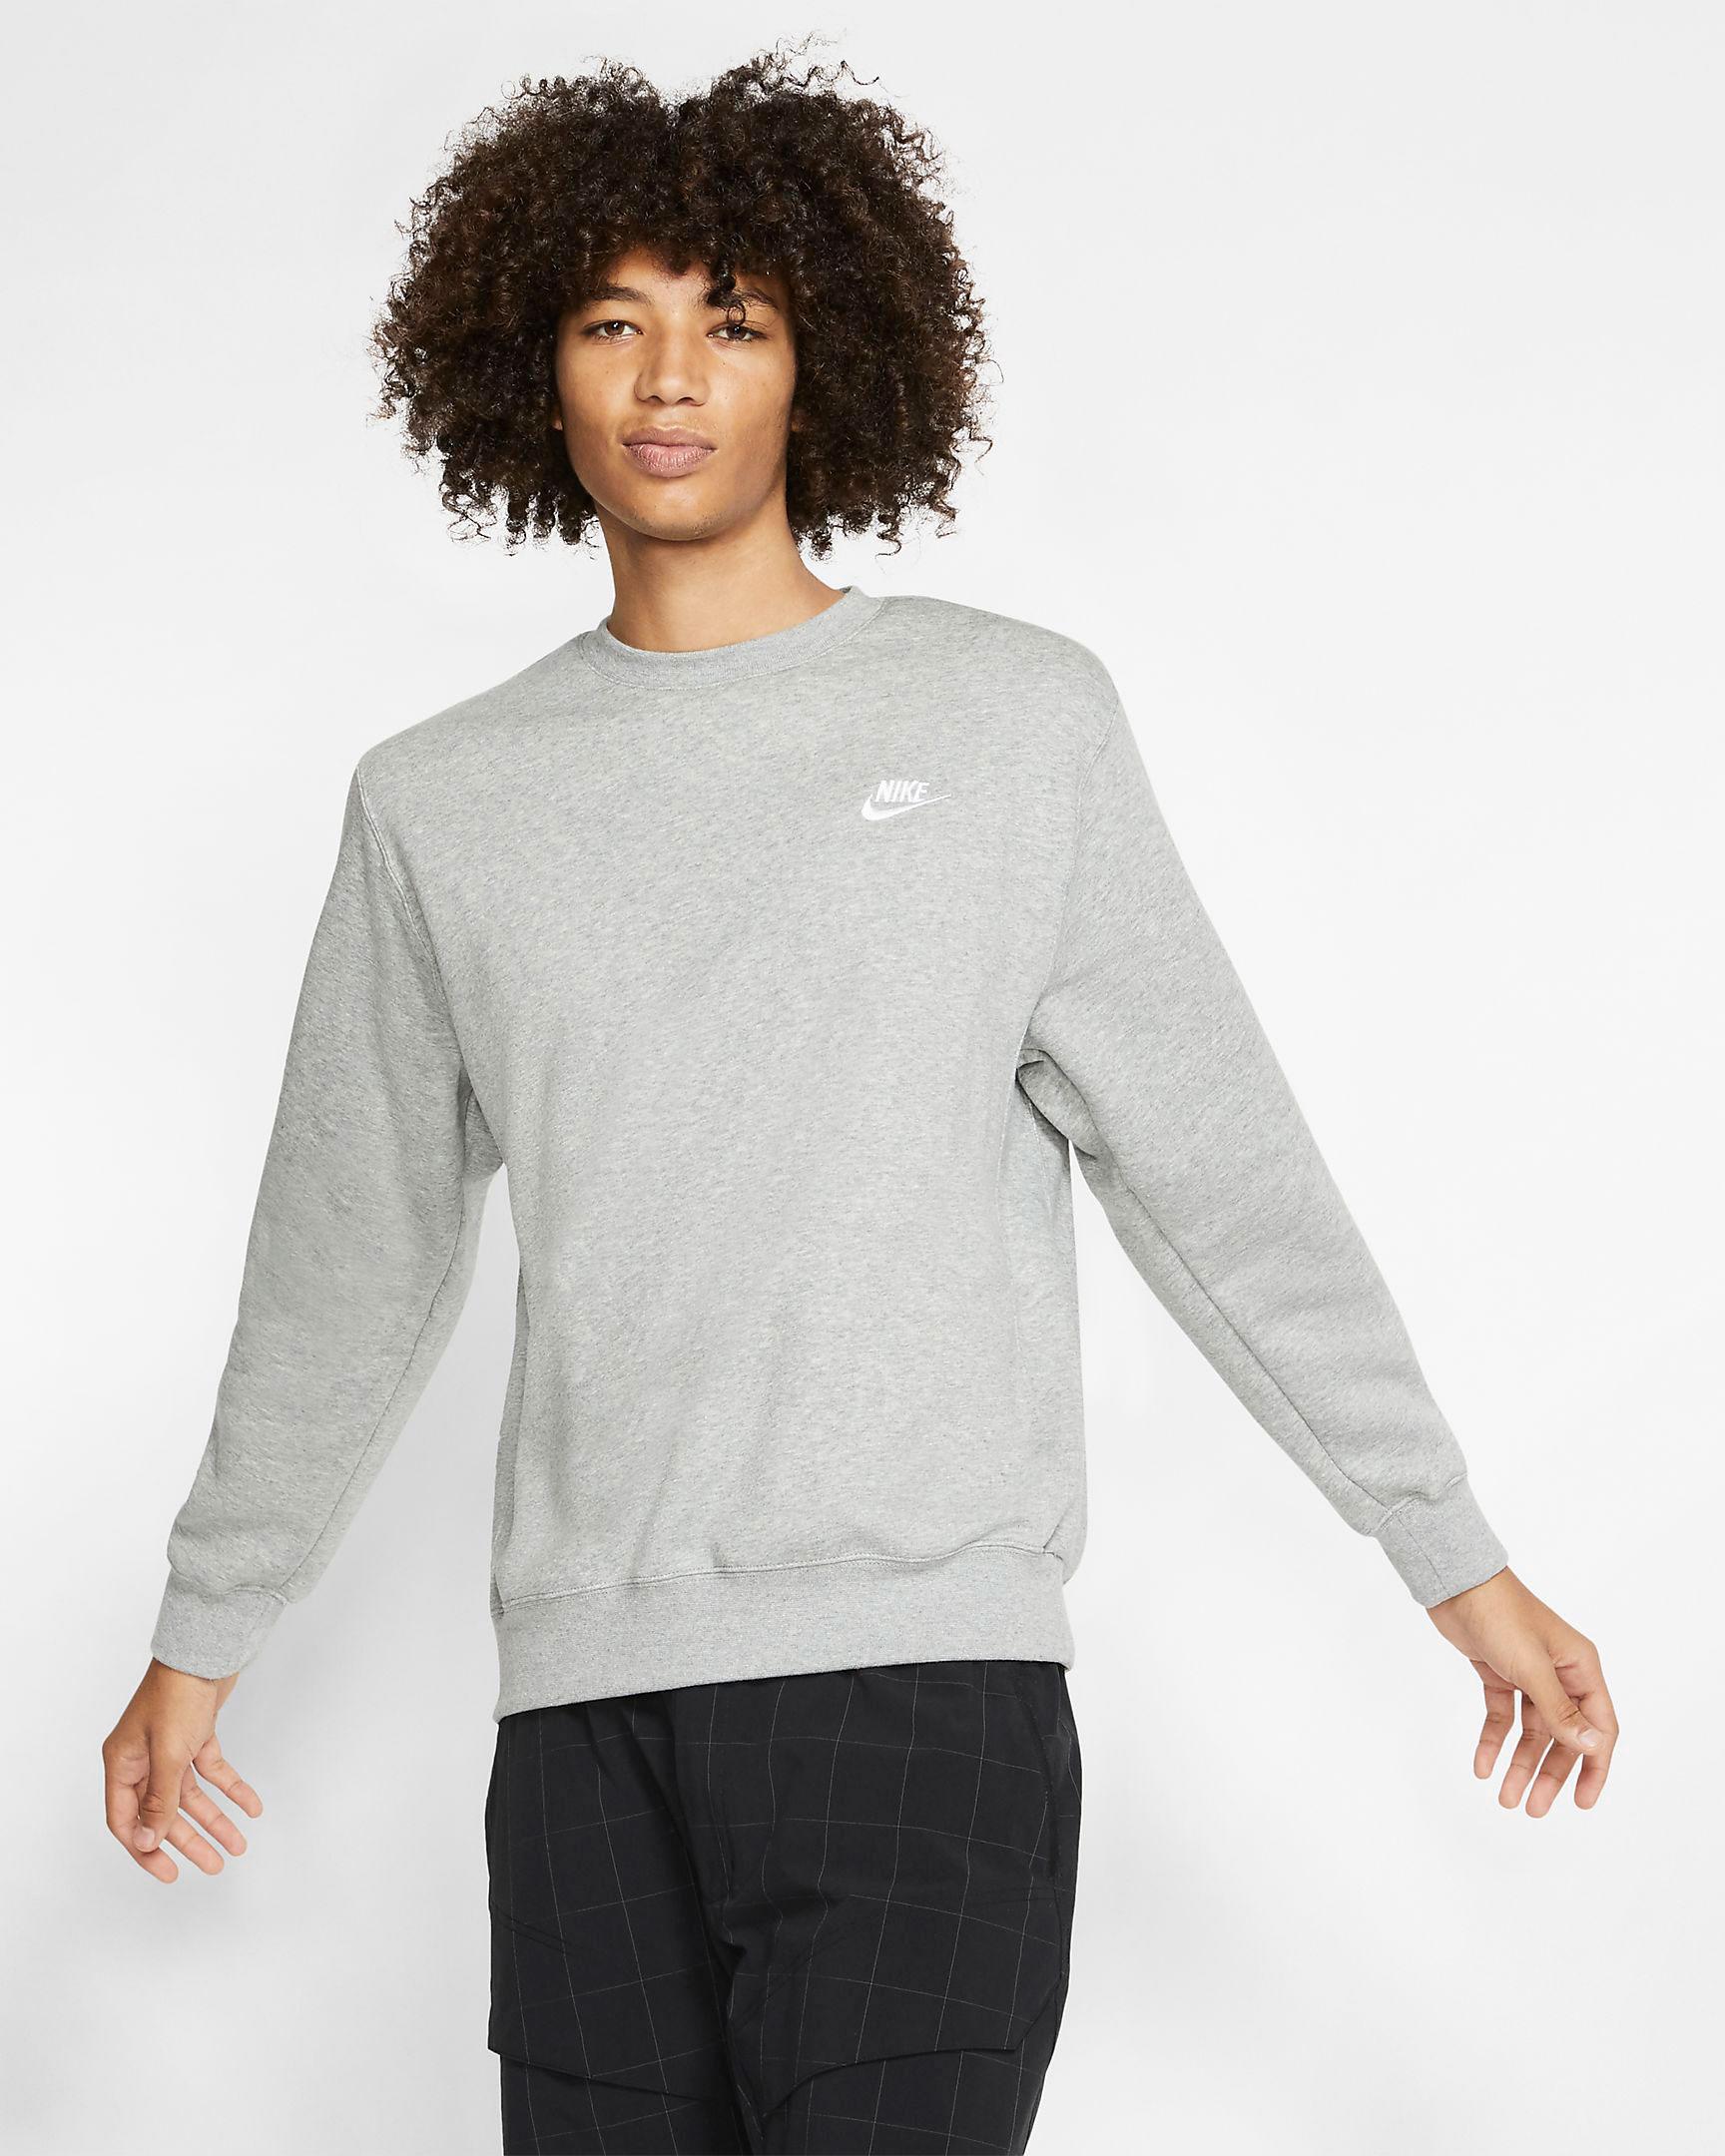 nike-air-max-95-neon-grey-crew-sweatshirt